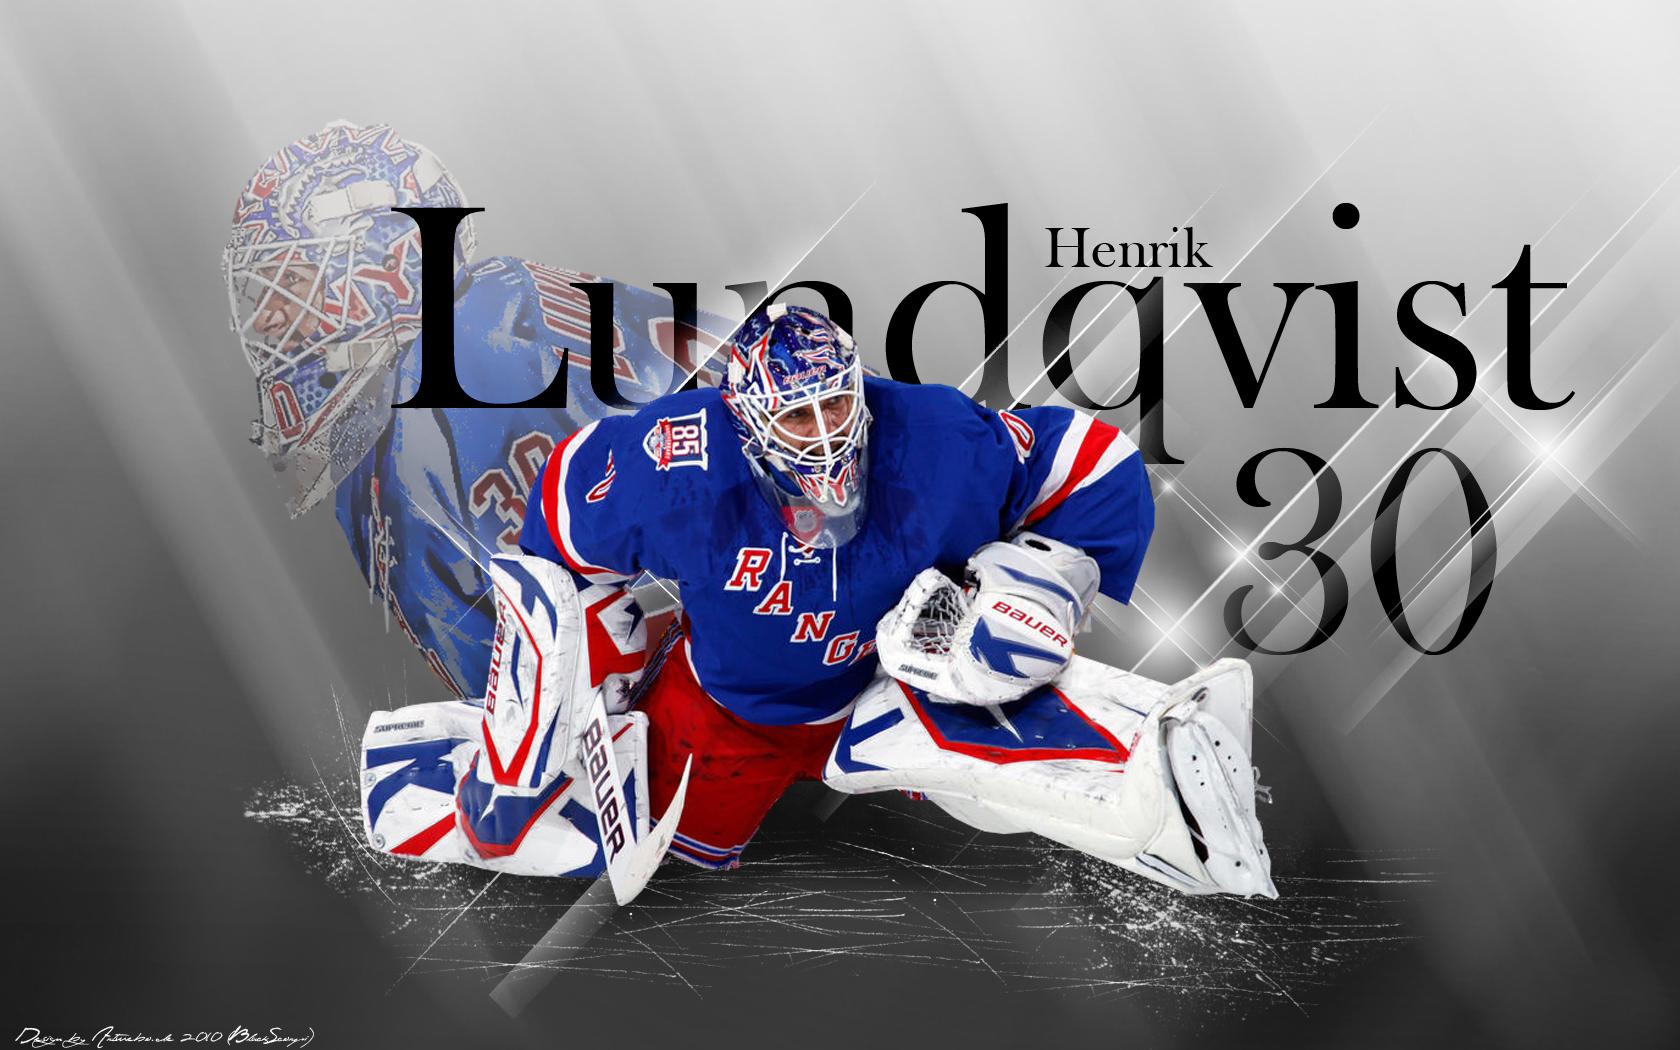 New York Rangers Hockey Player Henrik Ludqvist Wallpaper, - Henrik Lundqvist 2011 , HD Wallpaper & Backgrounds